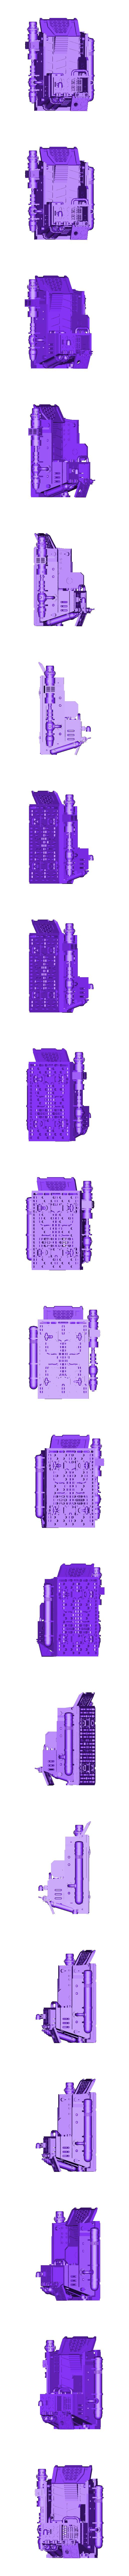 Jawa Shuttle scooter (assembled open).stl Download free STL file Jawa Shuttle Scooter • 3D printer template, polerix